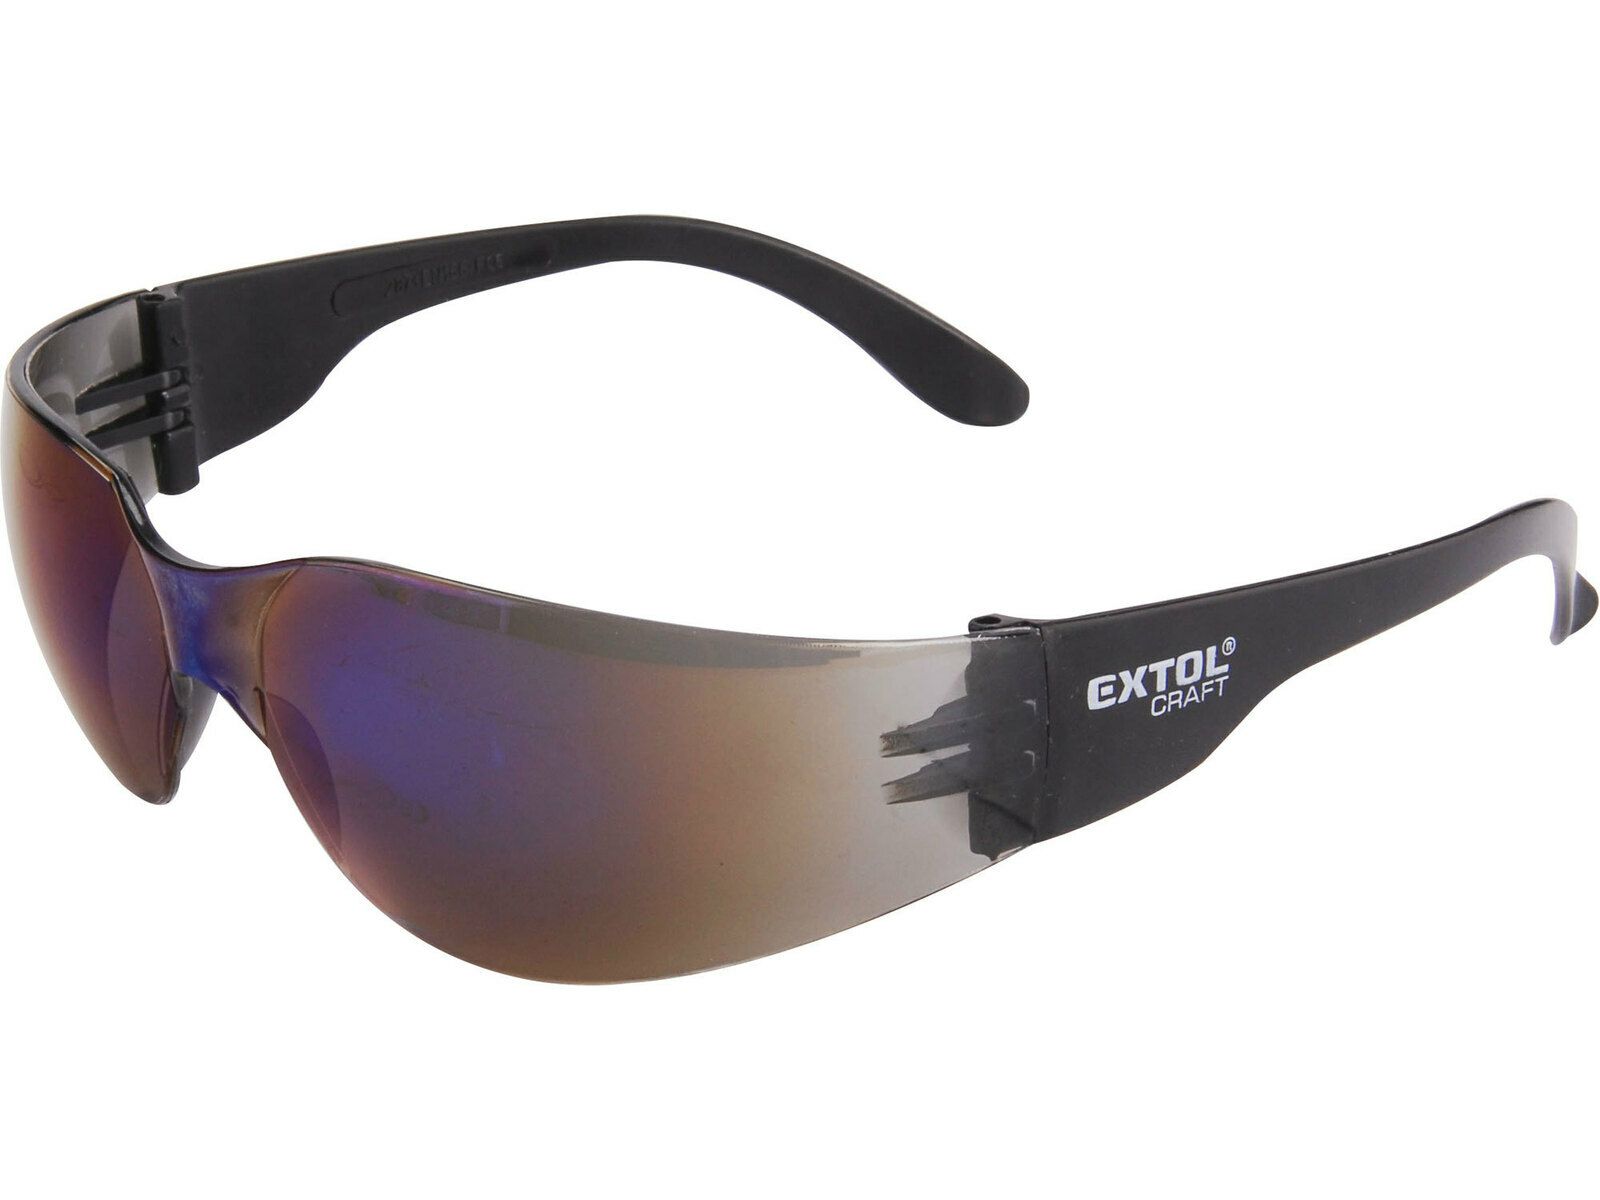 Brýle ochranné modré, EN 166 F - EXTOL CRAFT EX97322